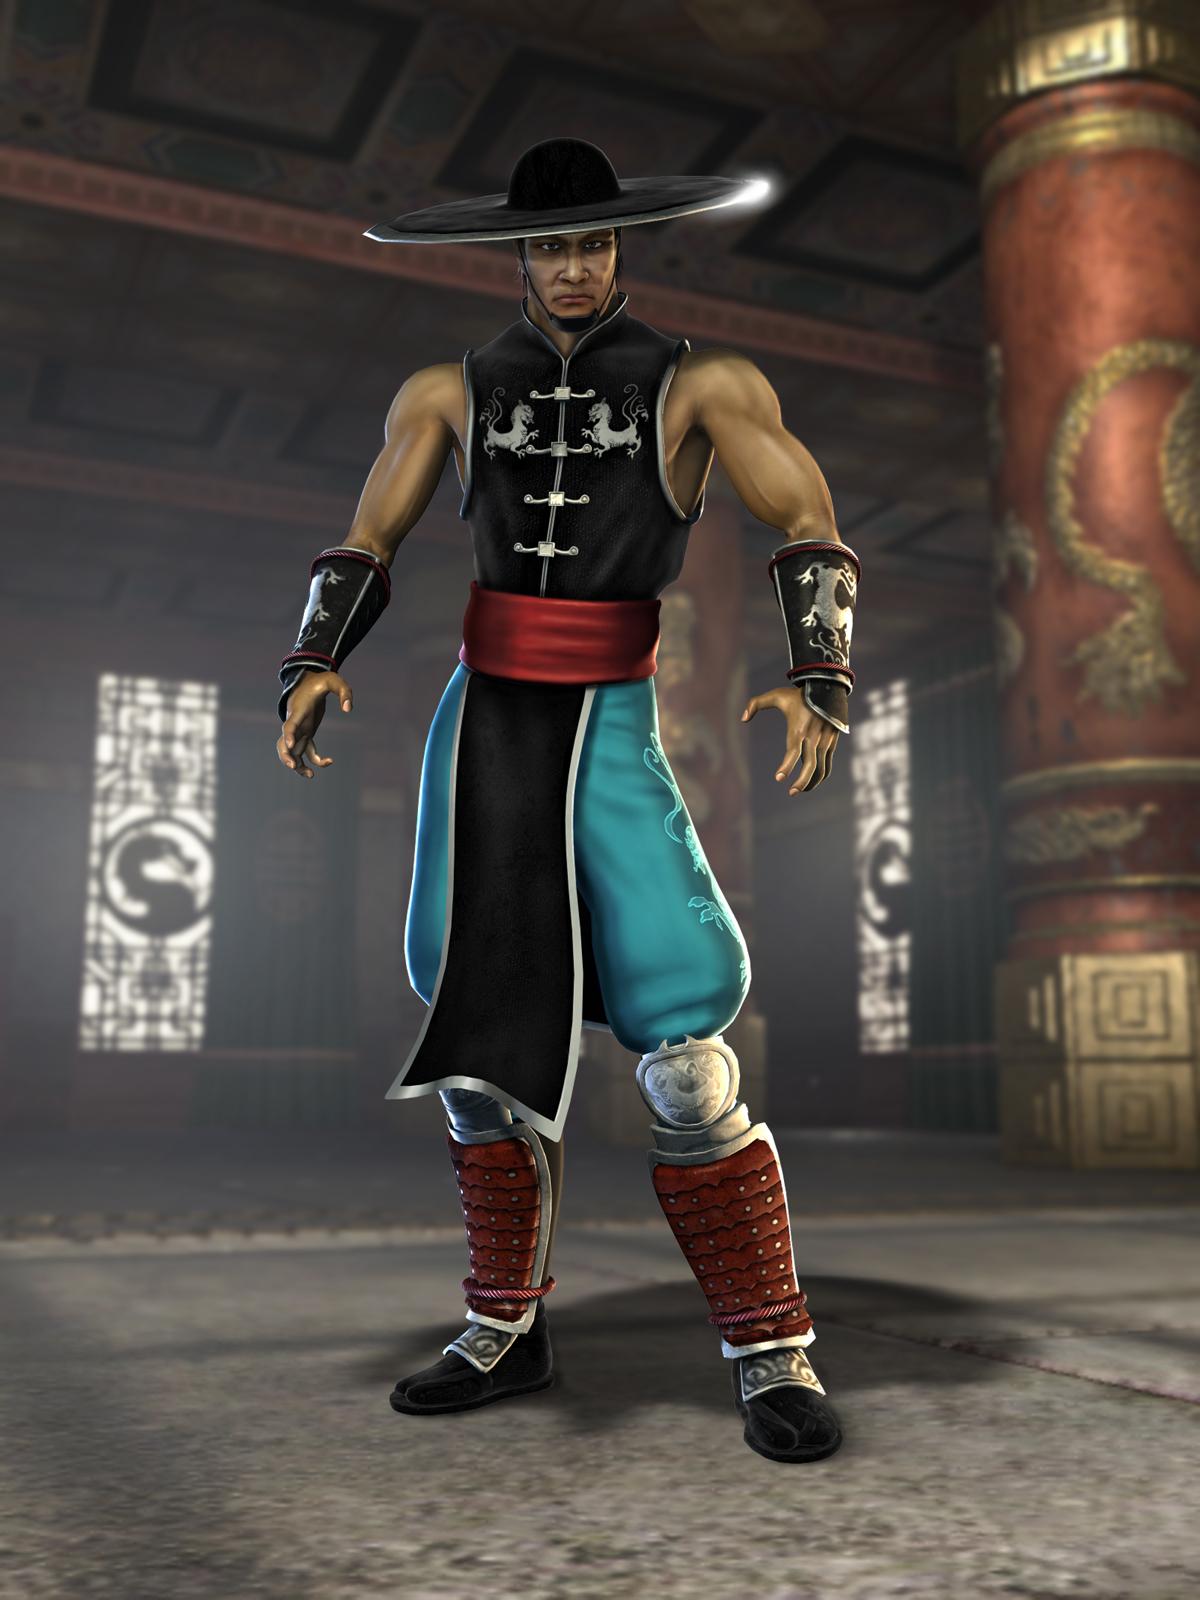 Normal die jax kung lao liu kang shang tsung sindel sub zero mortal kombat